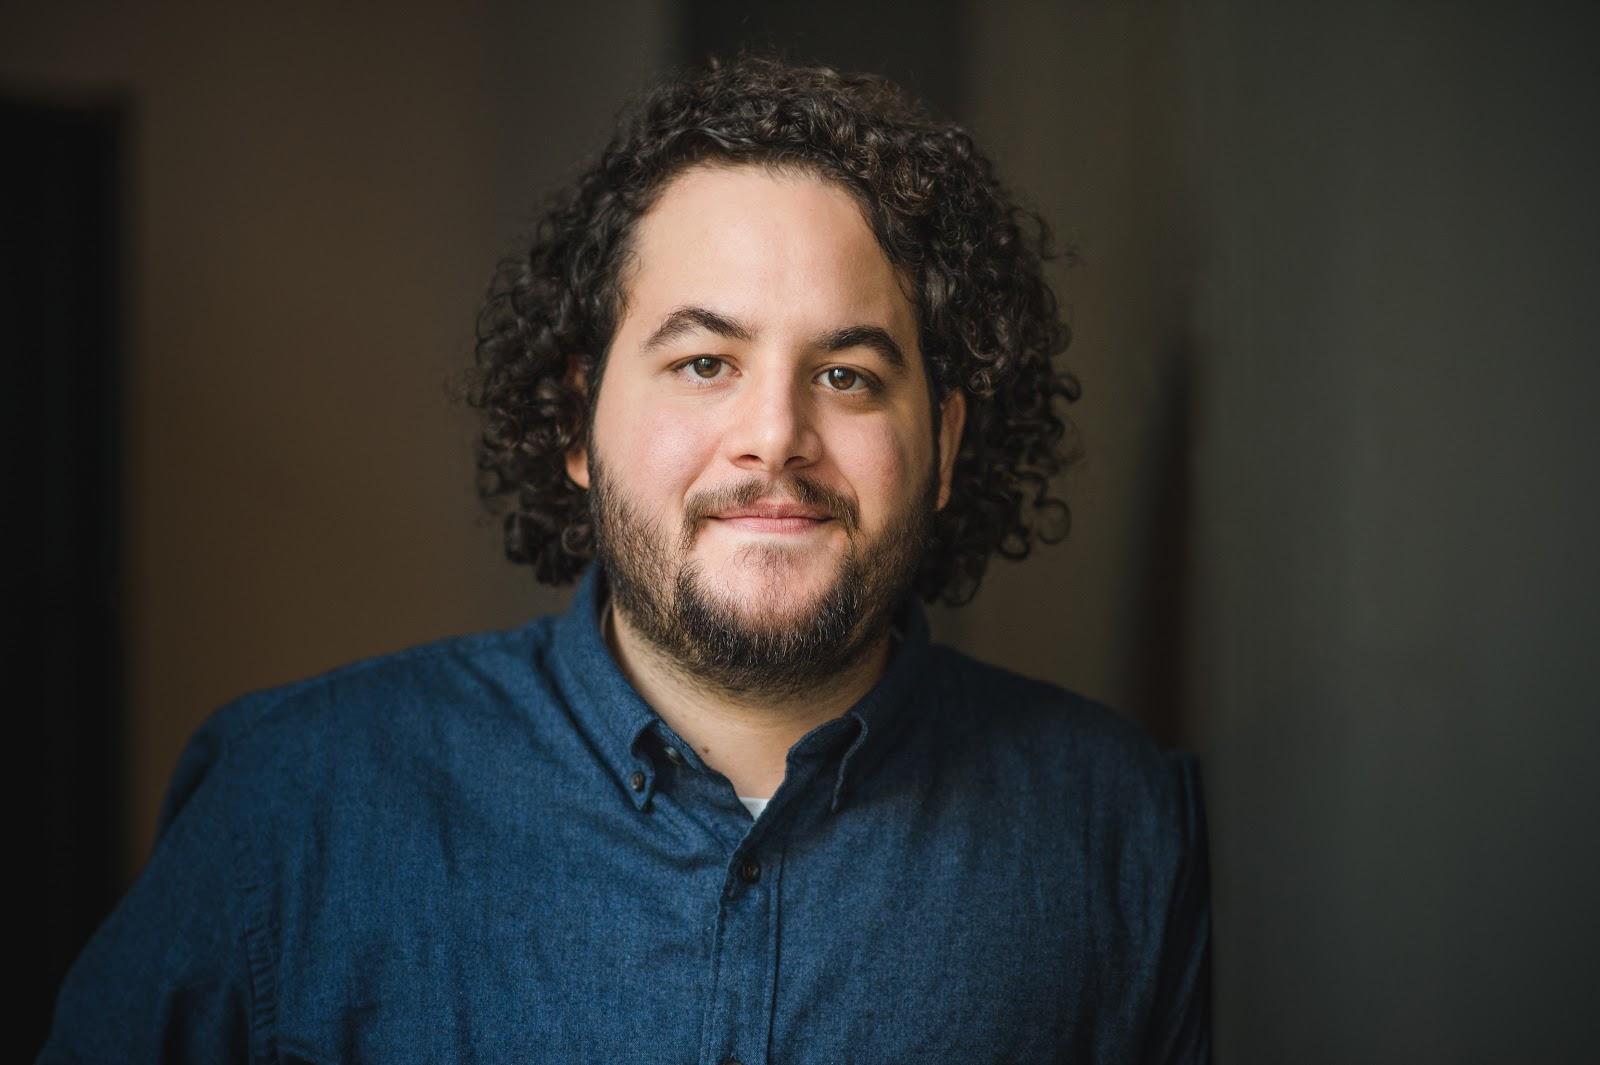 Lead Experience Designer Flávio Bezerra